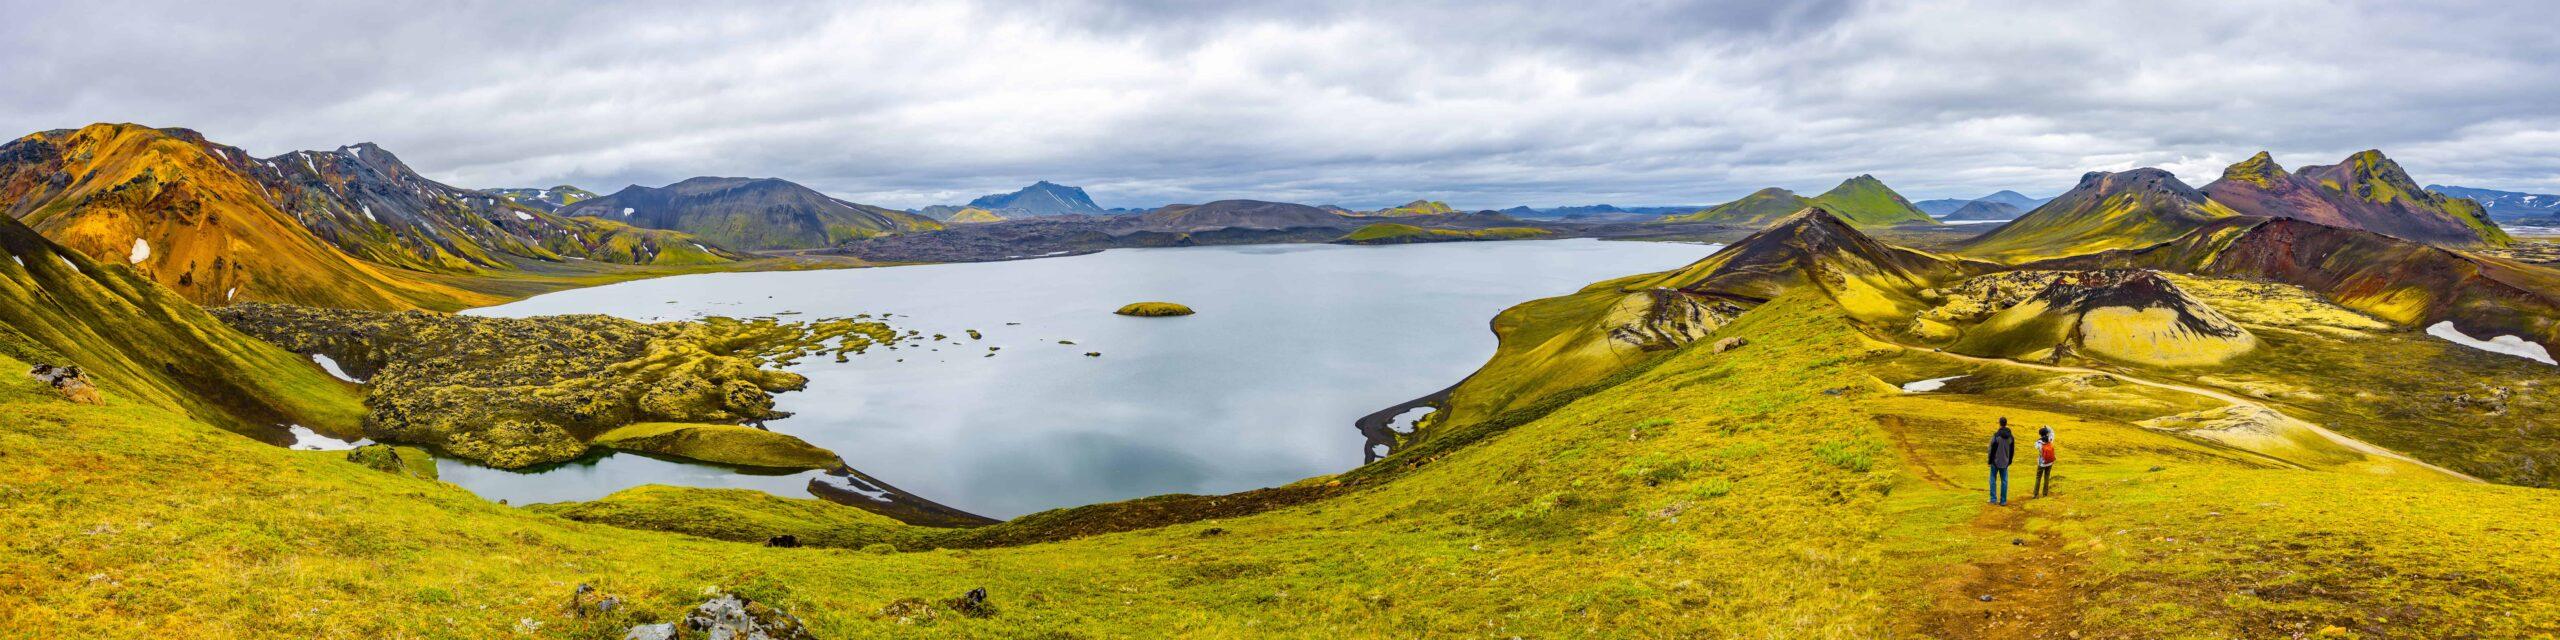 Landmannalaugar in the highlands of Iceland